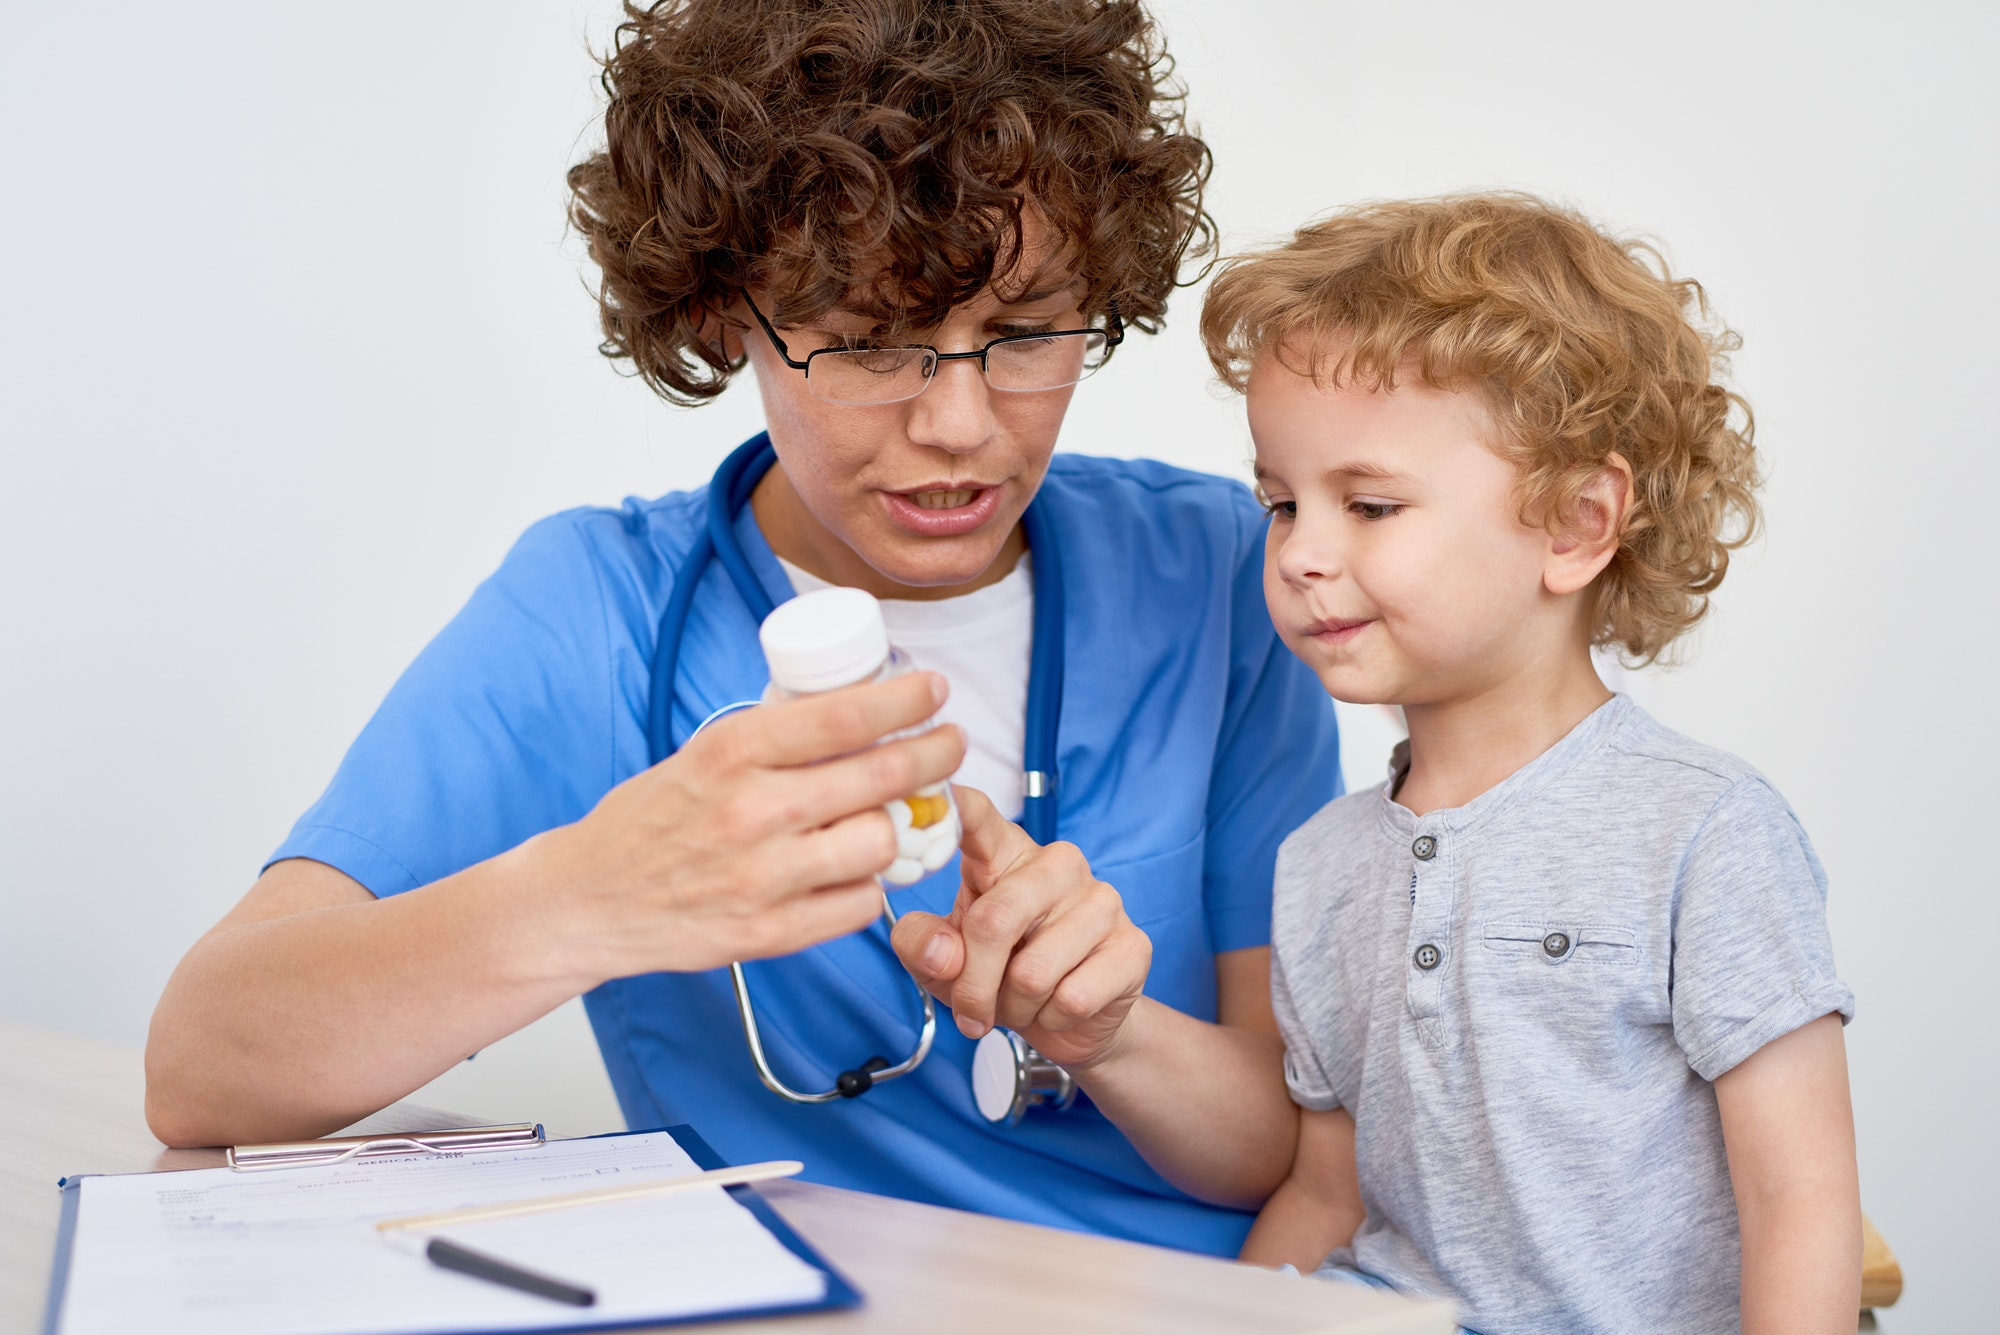 Nurse Giving Vitamins to Little Child